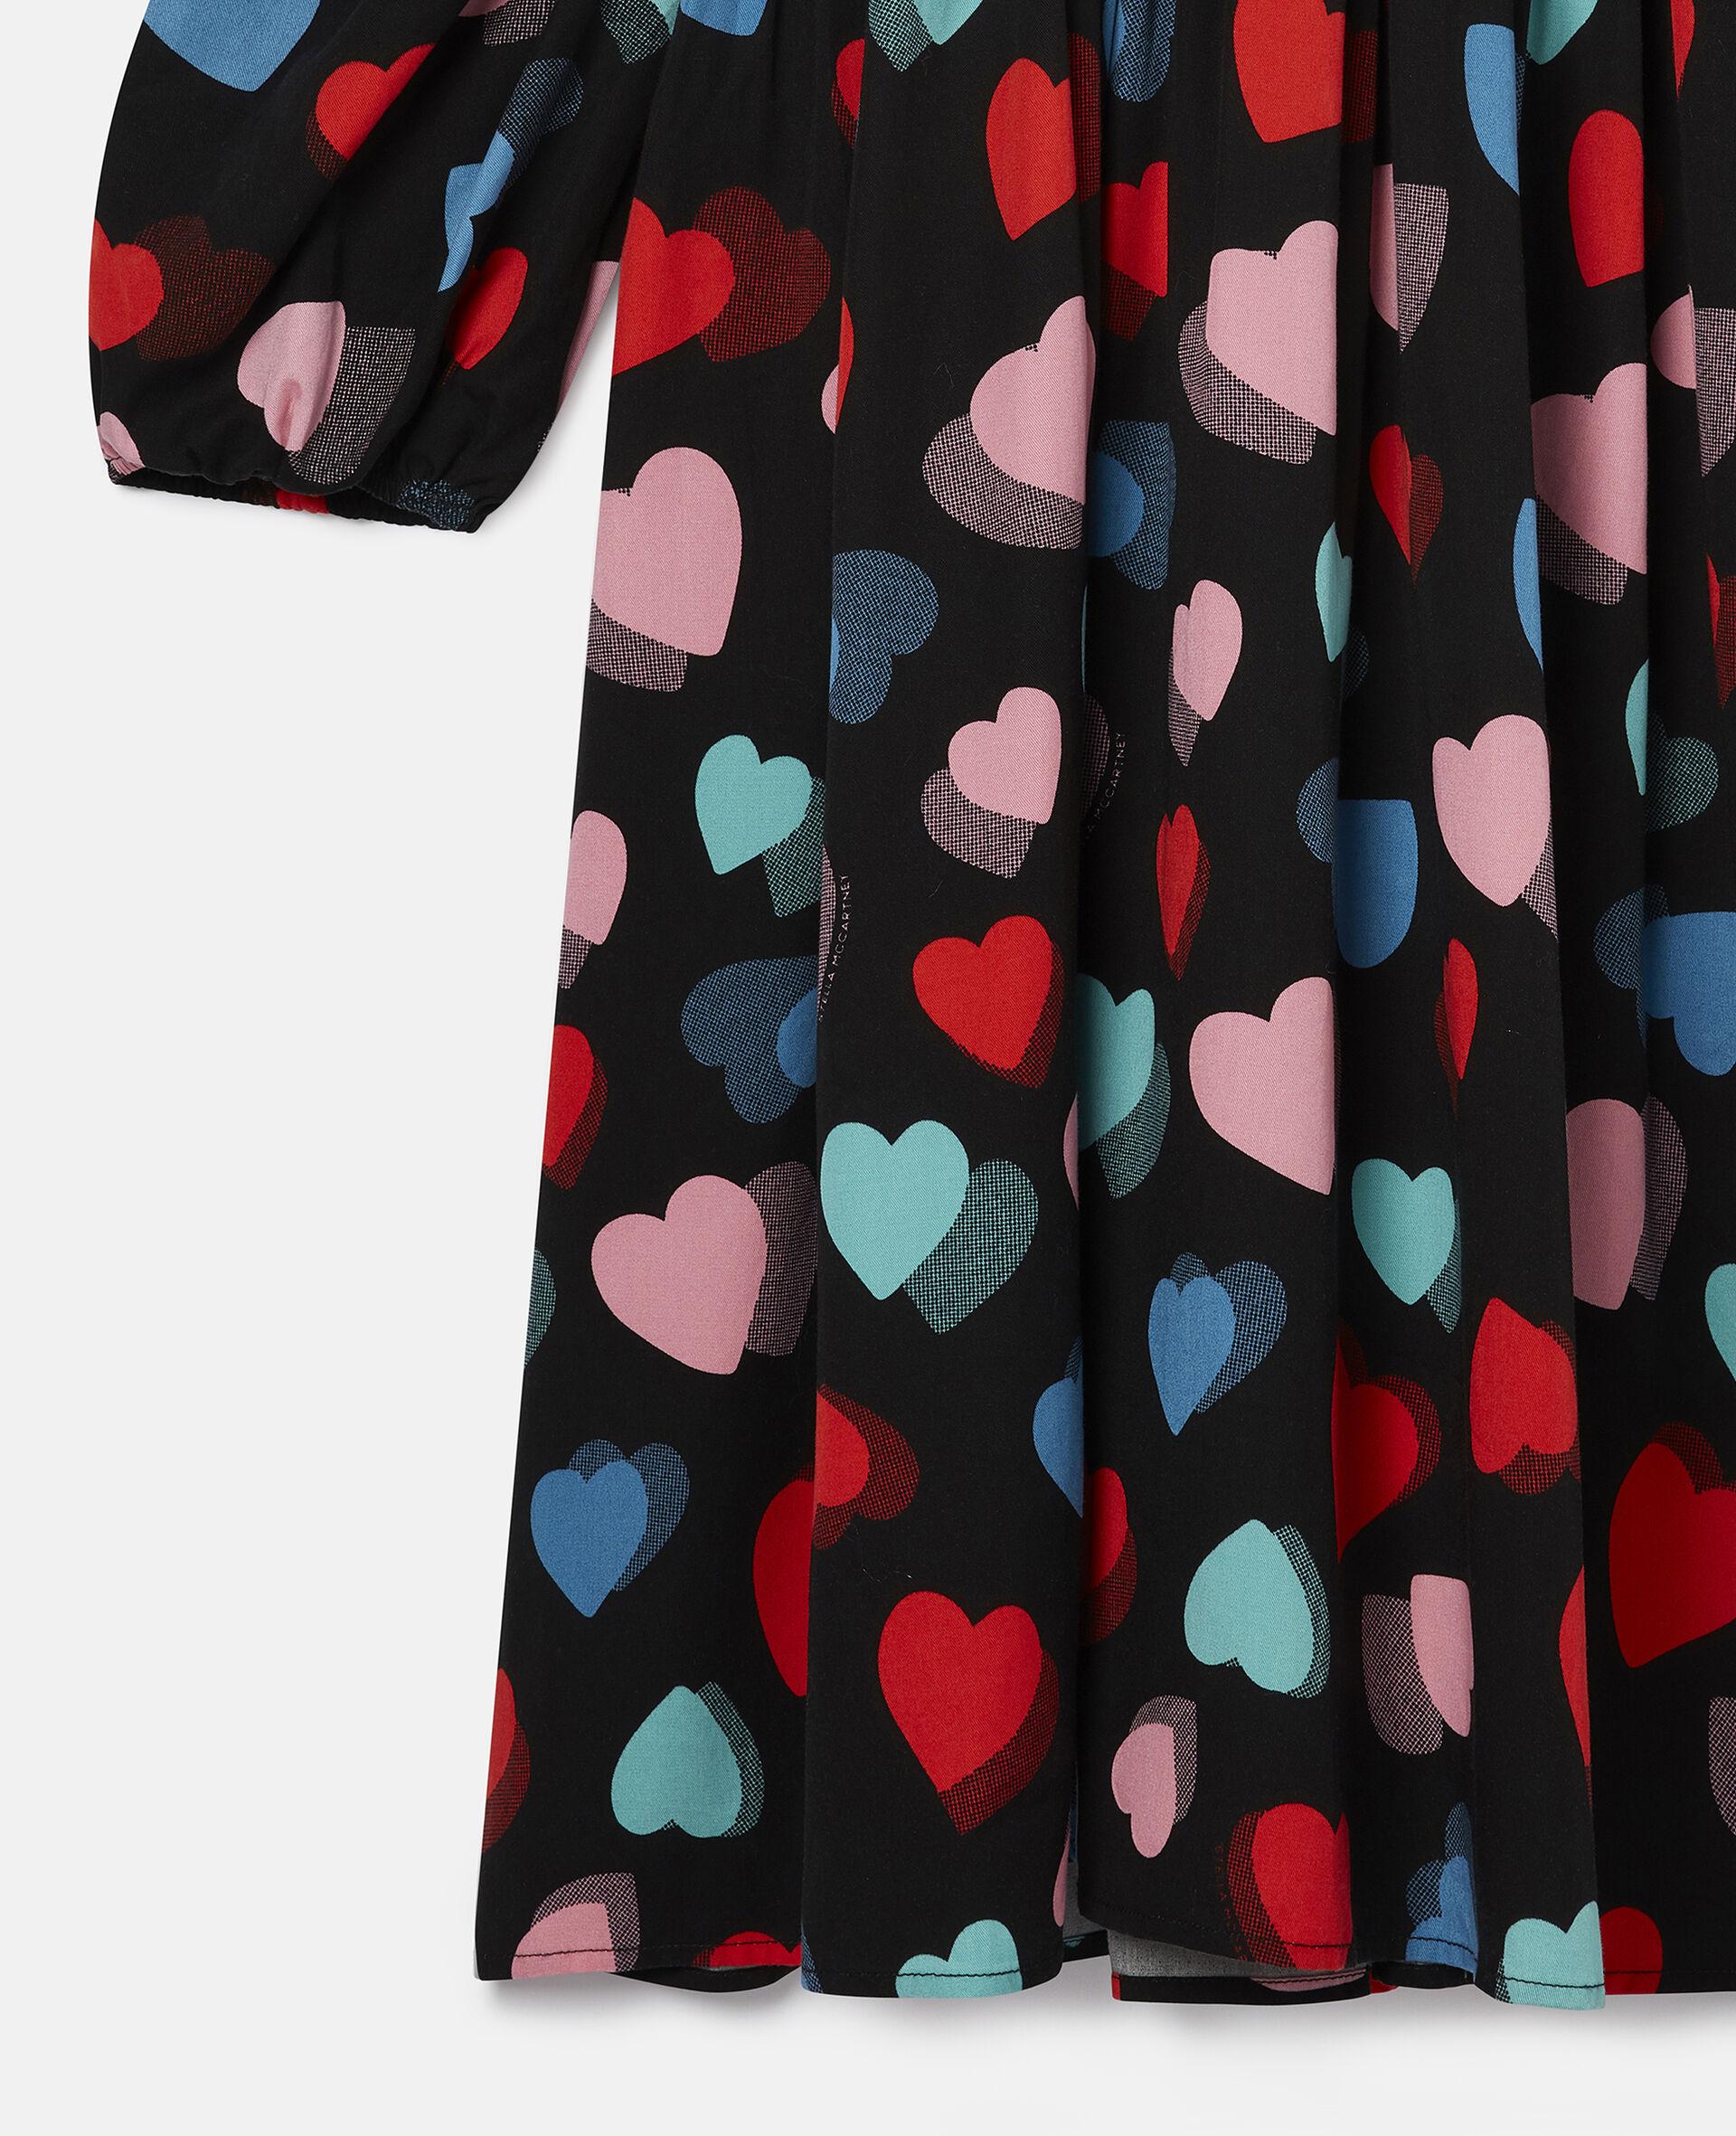 Kleid aus Tencel-Twill mit Herzen-Print-Bunt-large image number 1